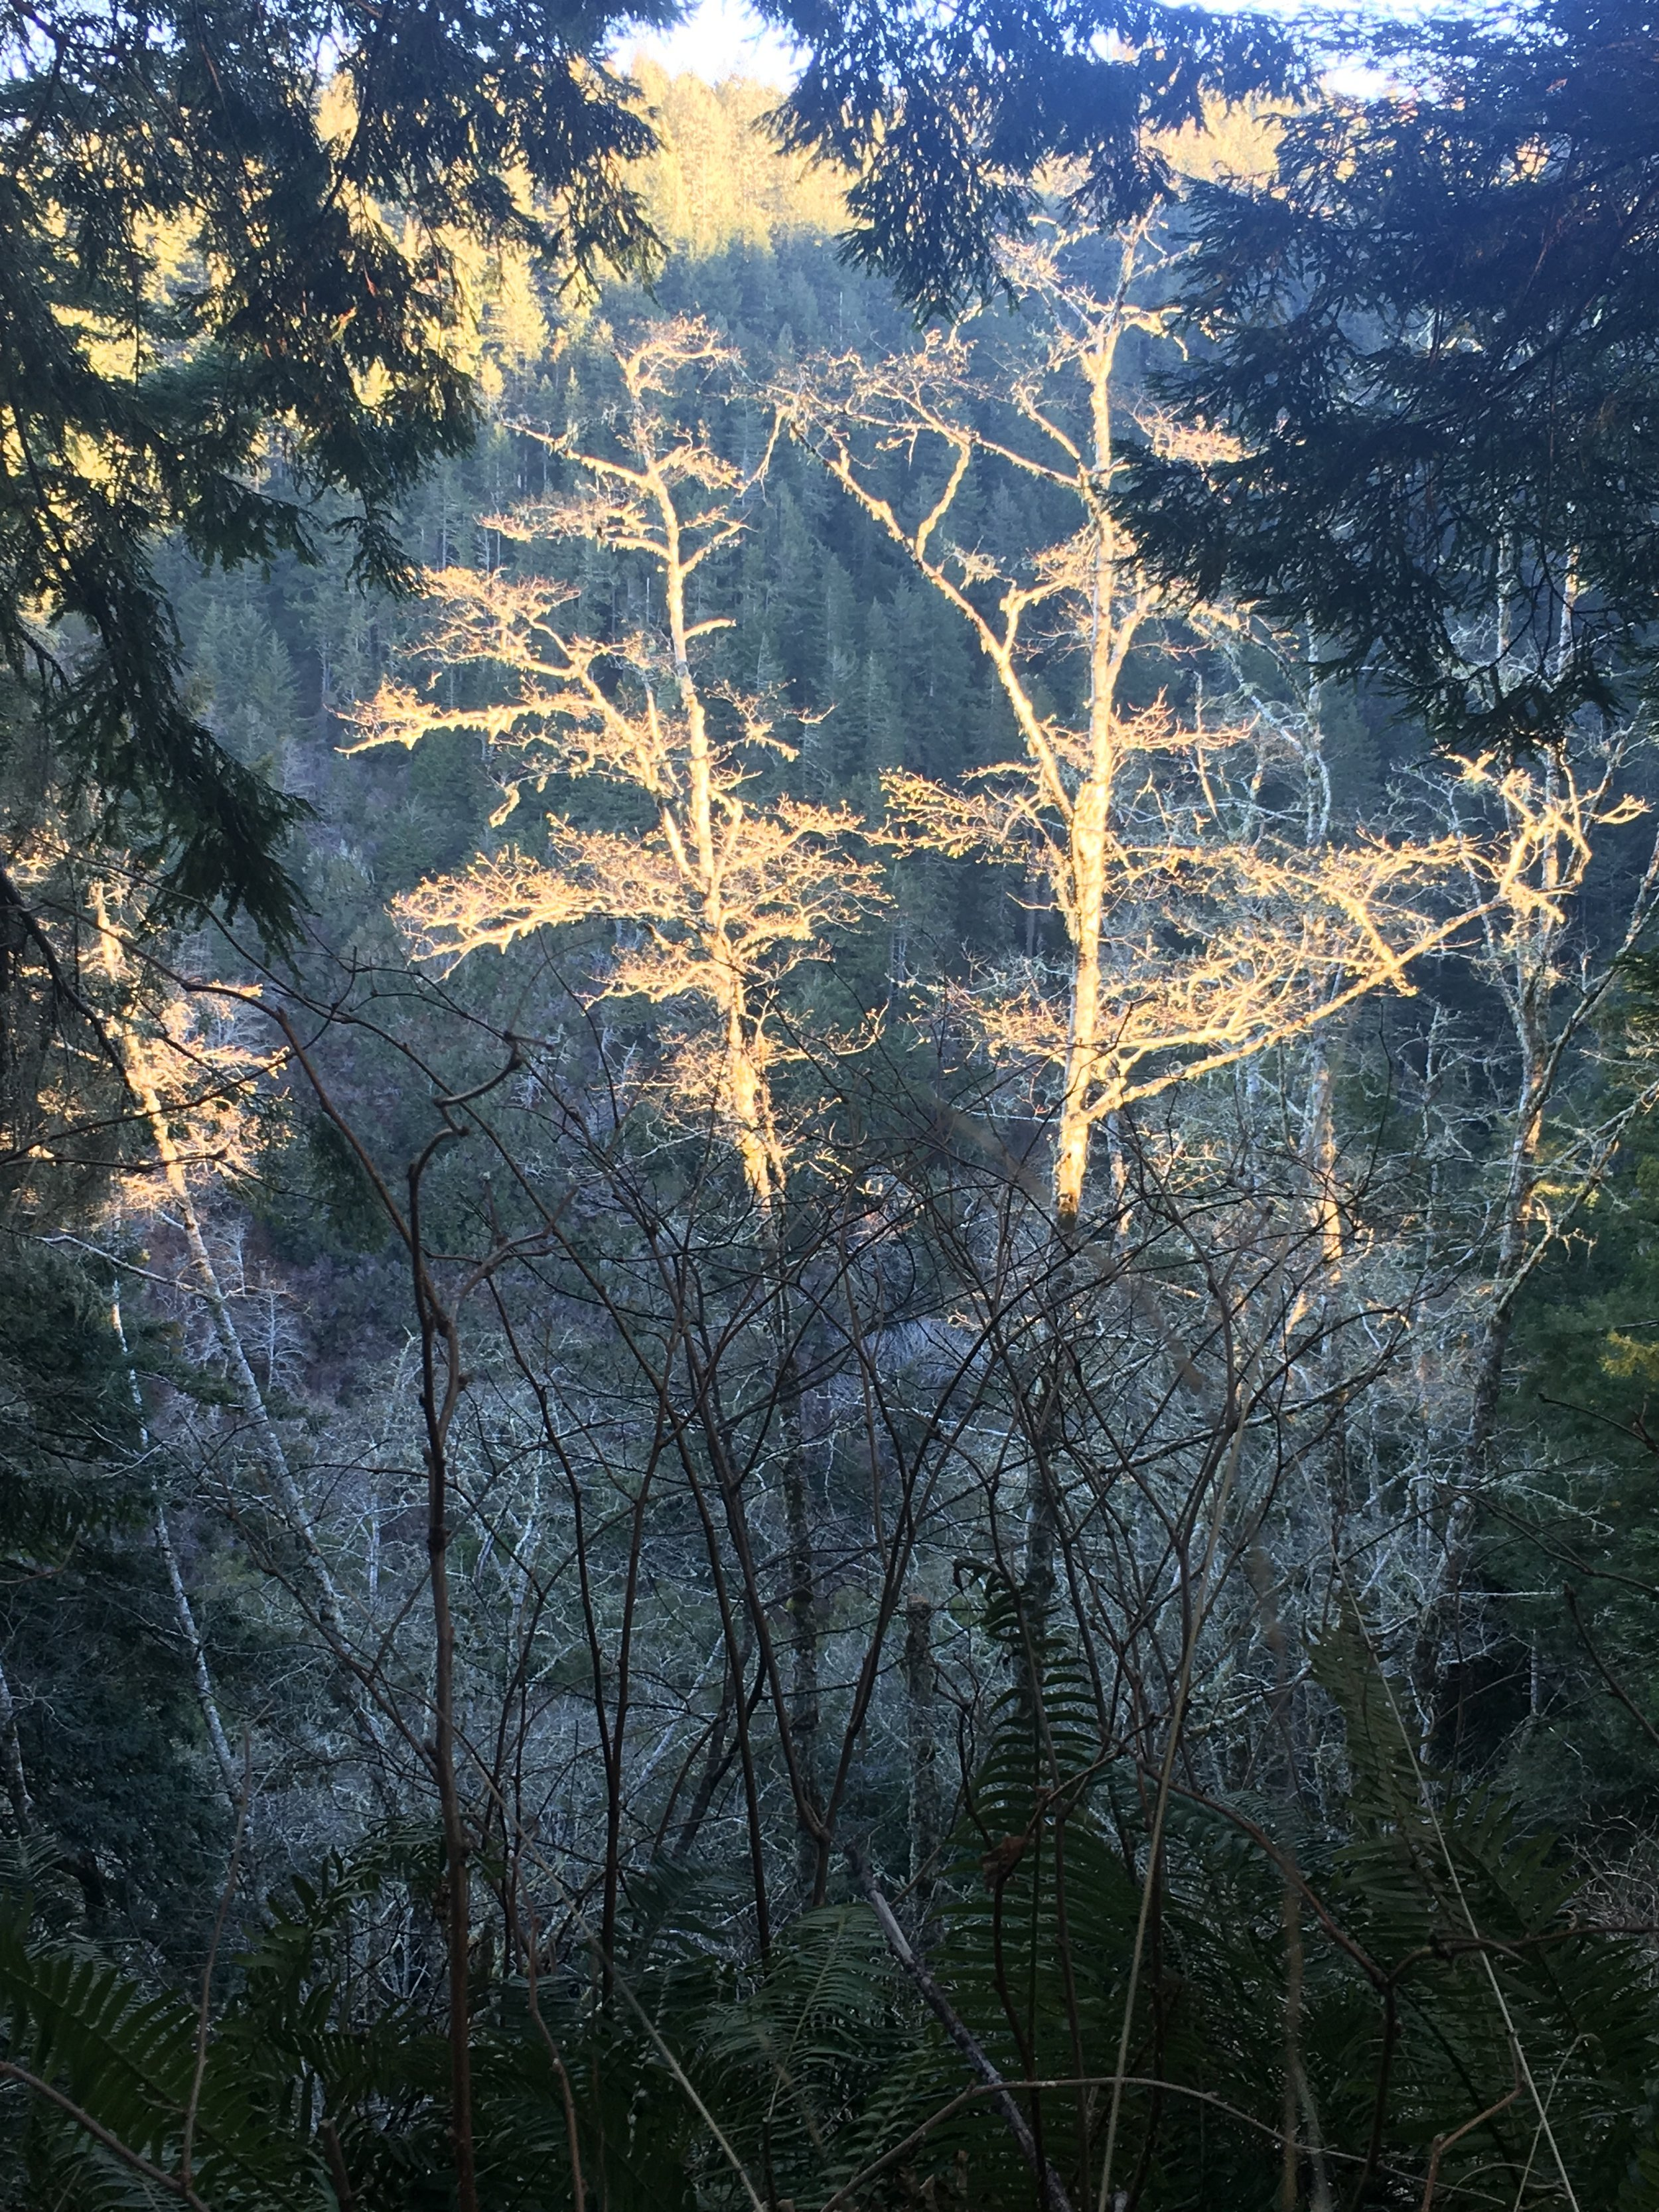 sunrise hits the ravine below Last Chance trail